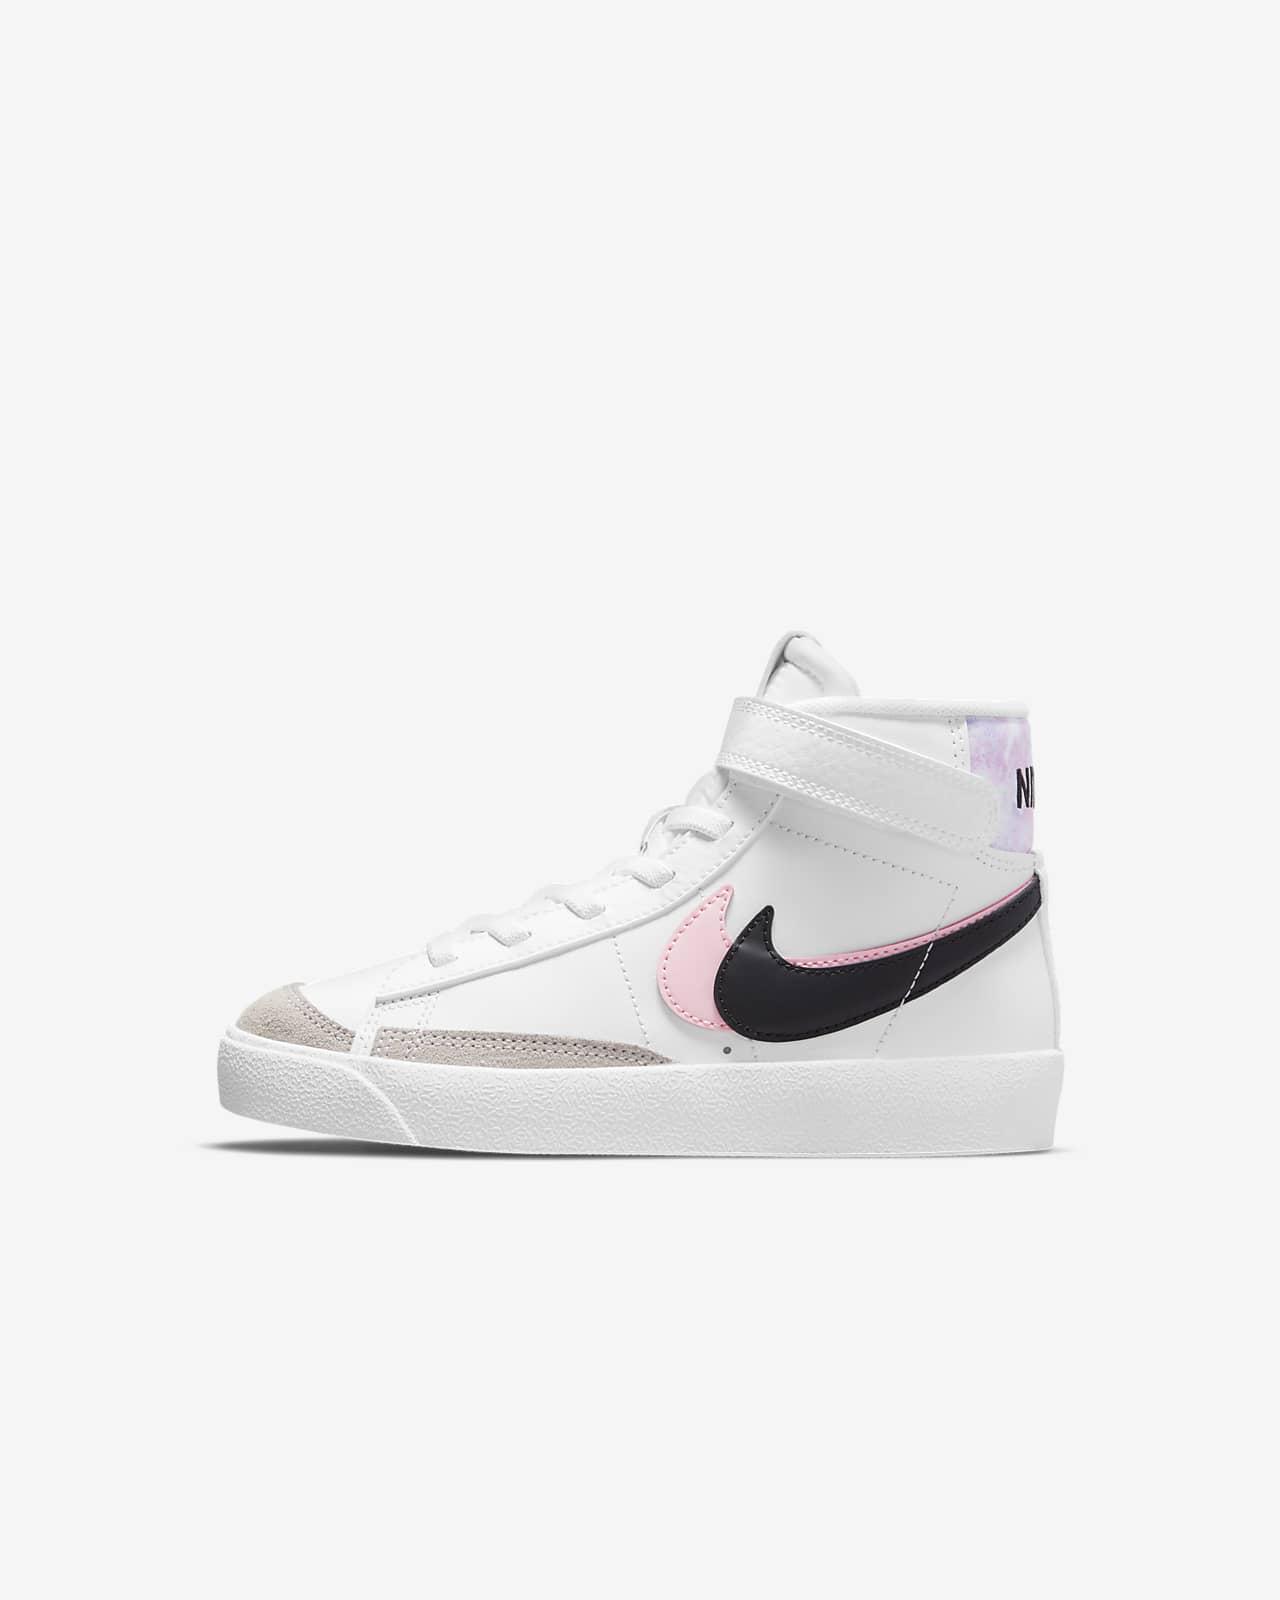 Calzado para niños talla pequeña Nike Blazer Mid '77 SE